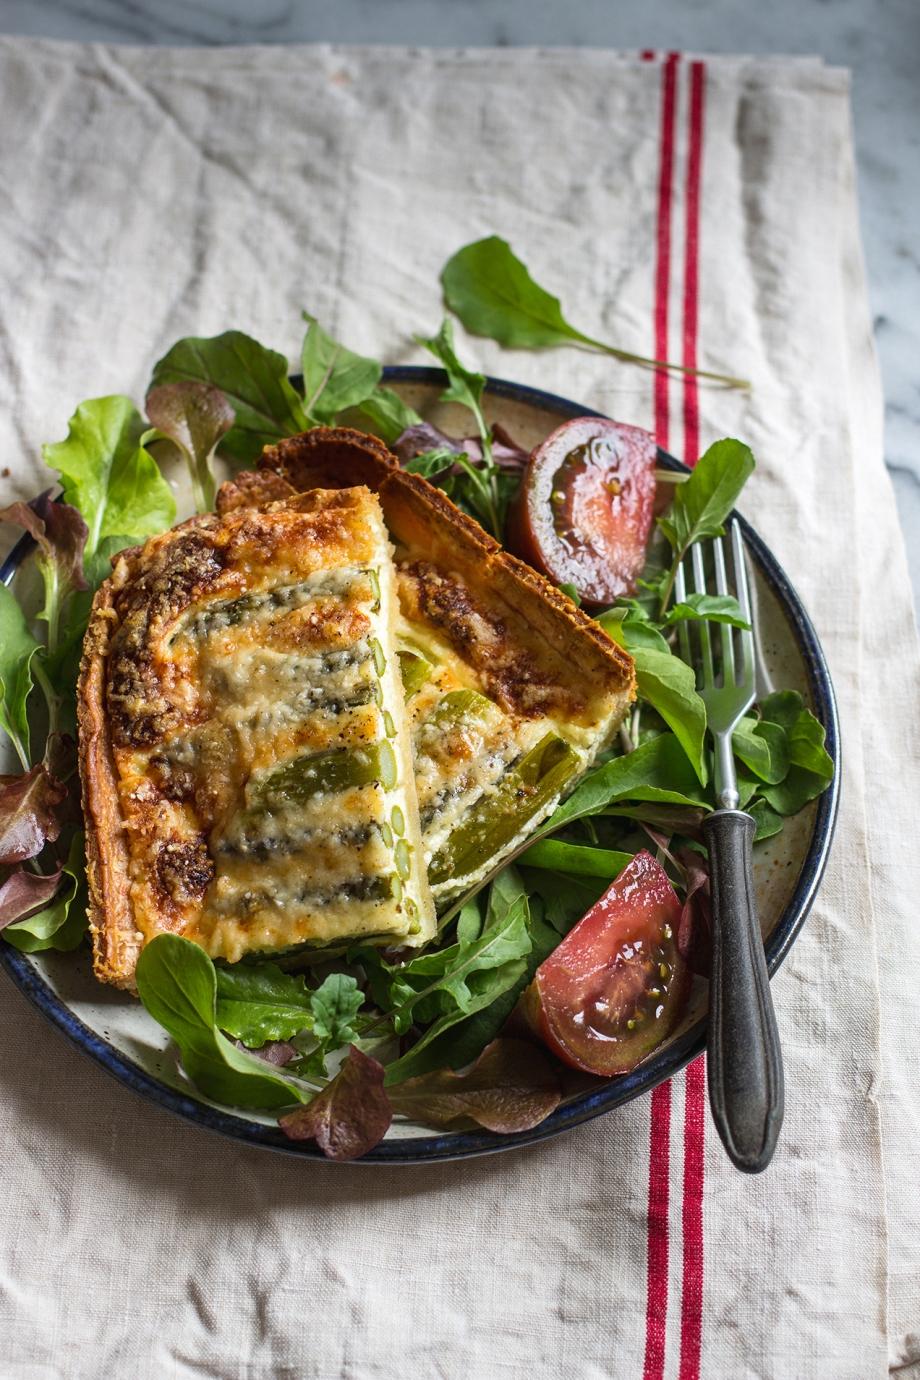 Asparagus and Parmesan tart | chilitonka